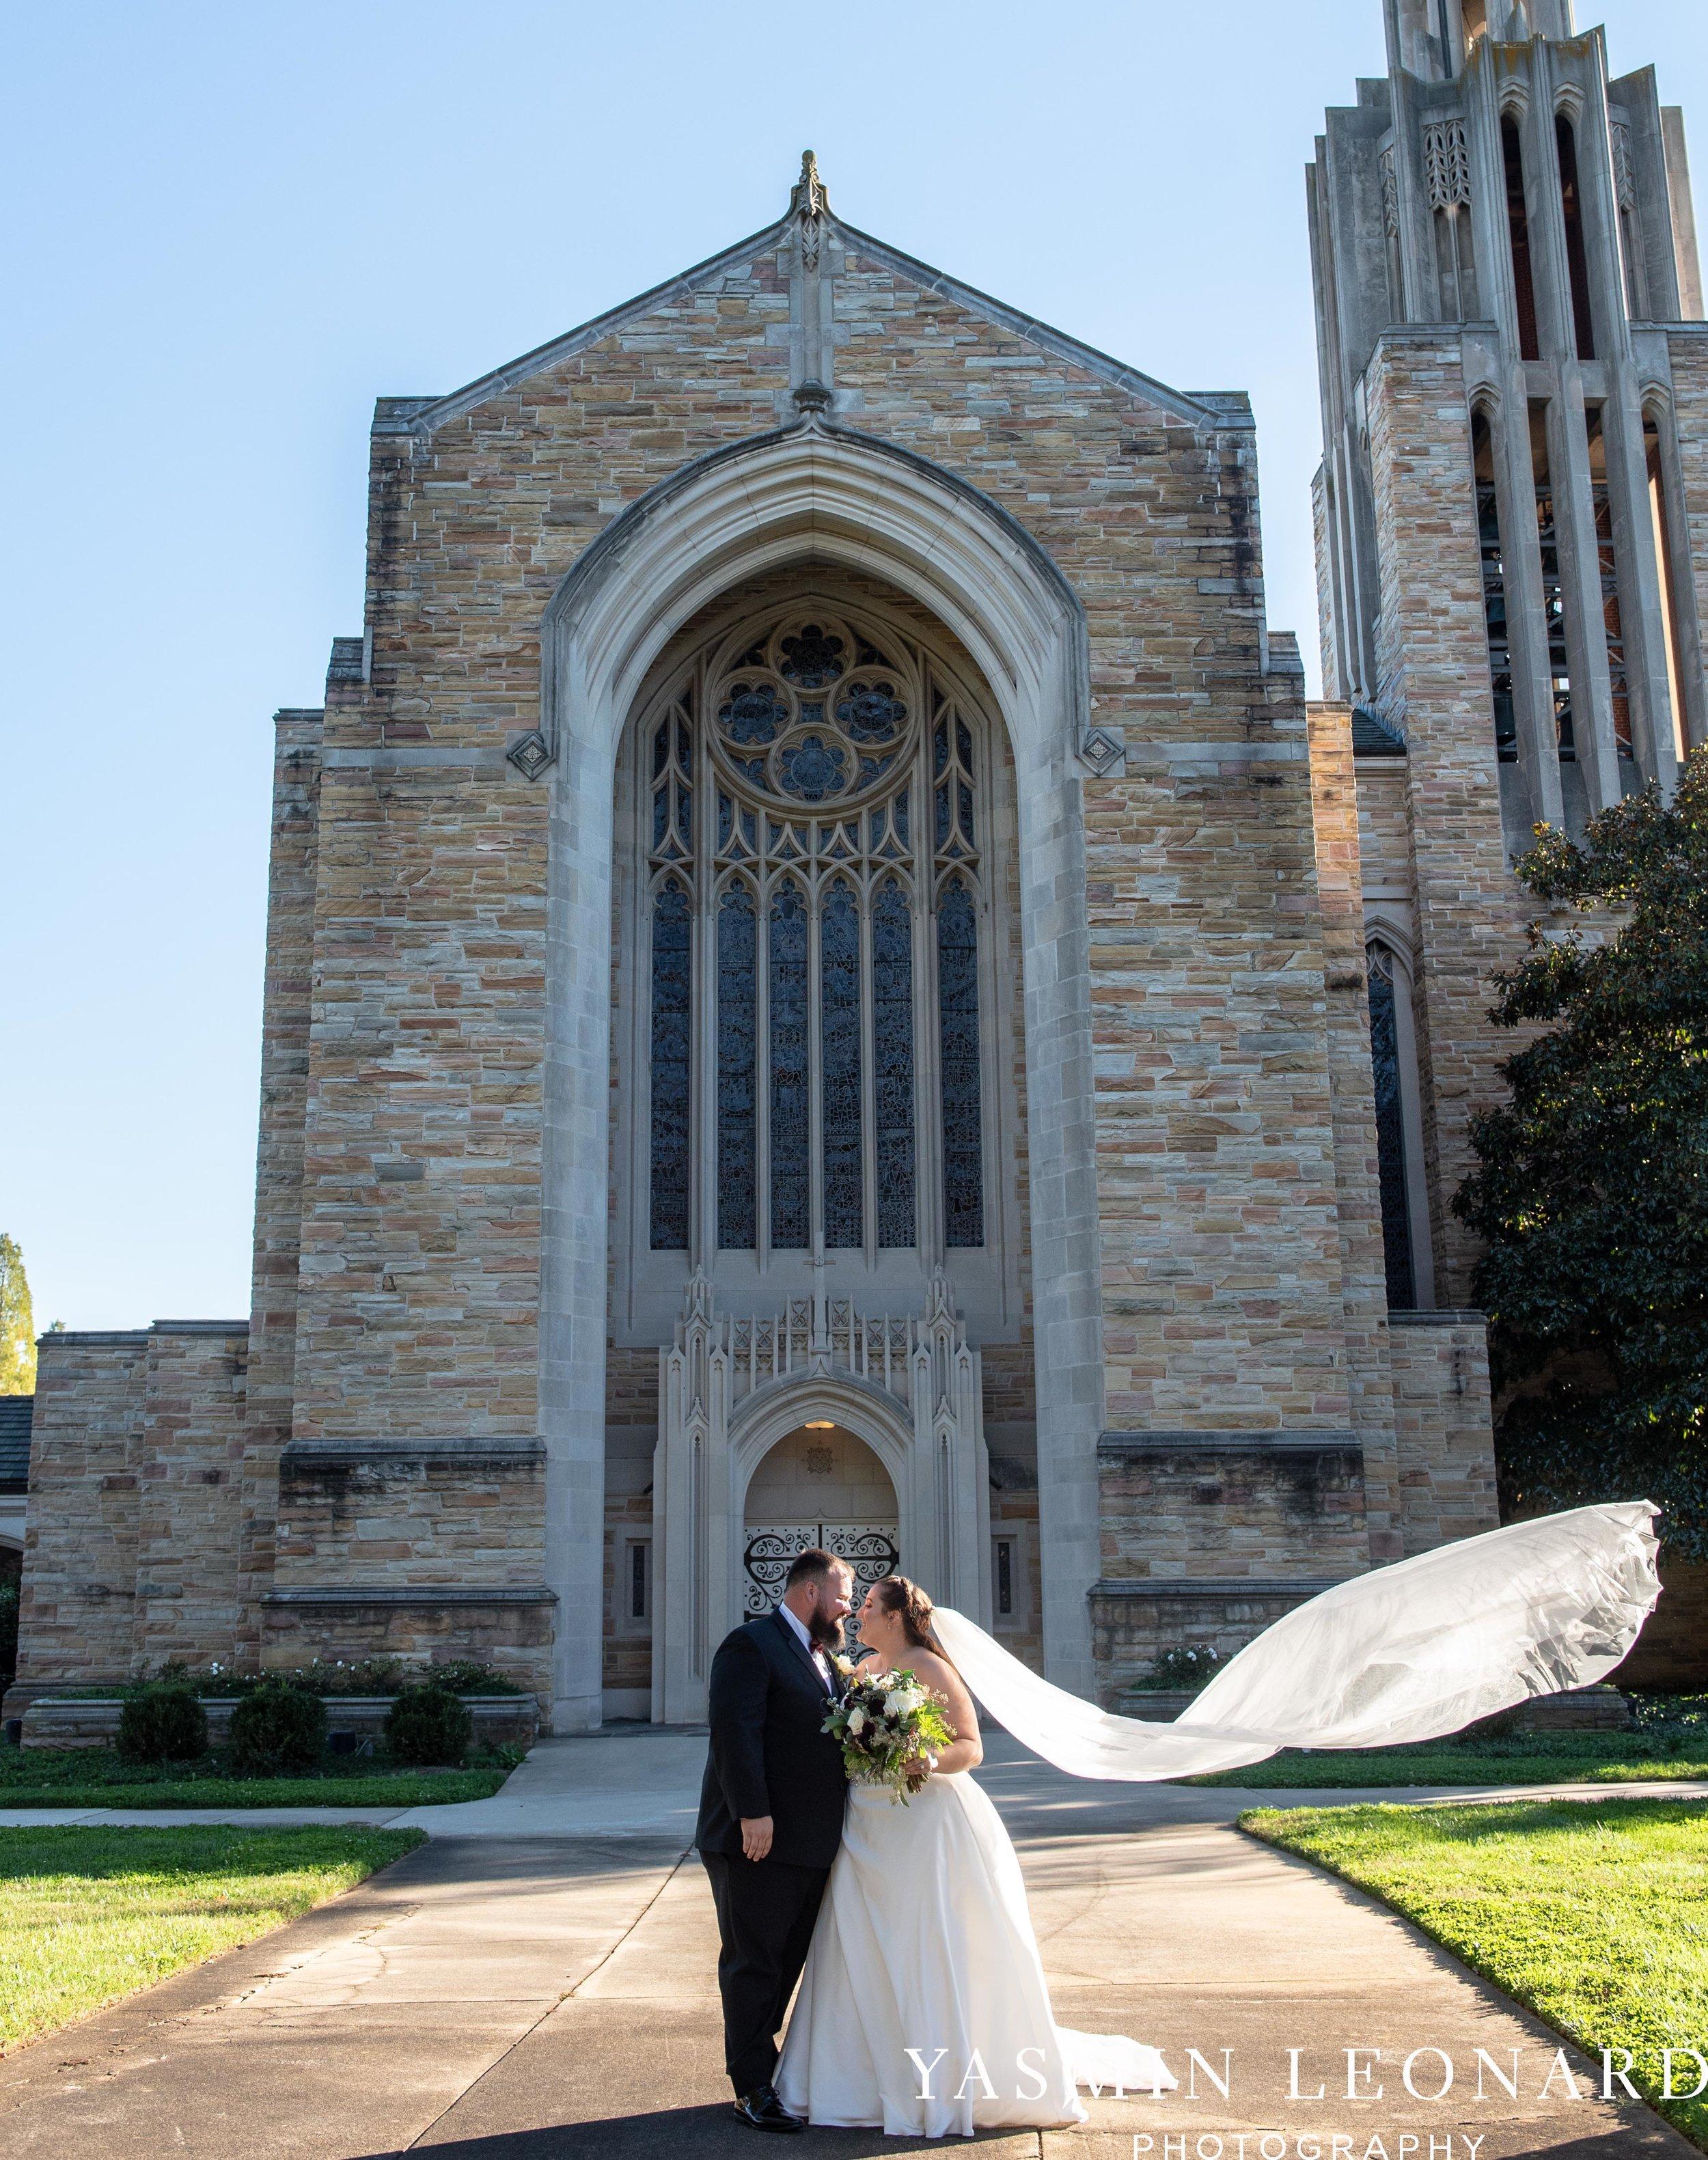 Wesley Memorial United Methodist Church - Old Homeplace Winery - High Point Weddings - High Point Wedding Photographer - NC Weddings - NC Barn Venue - Yasmin Leonard Photography-32.jpg